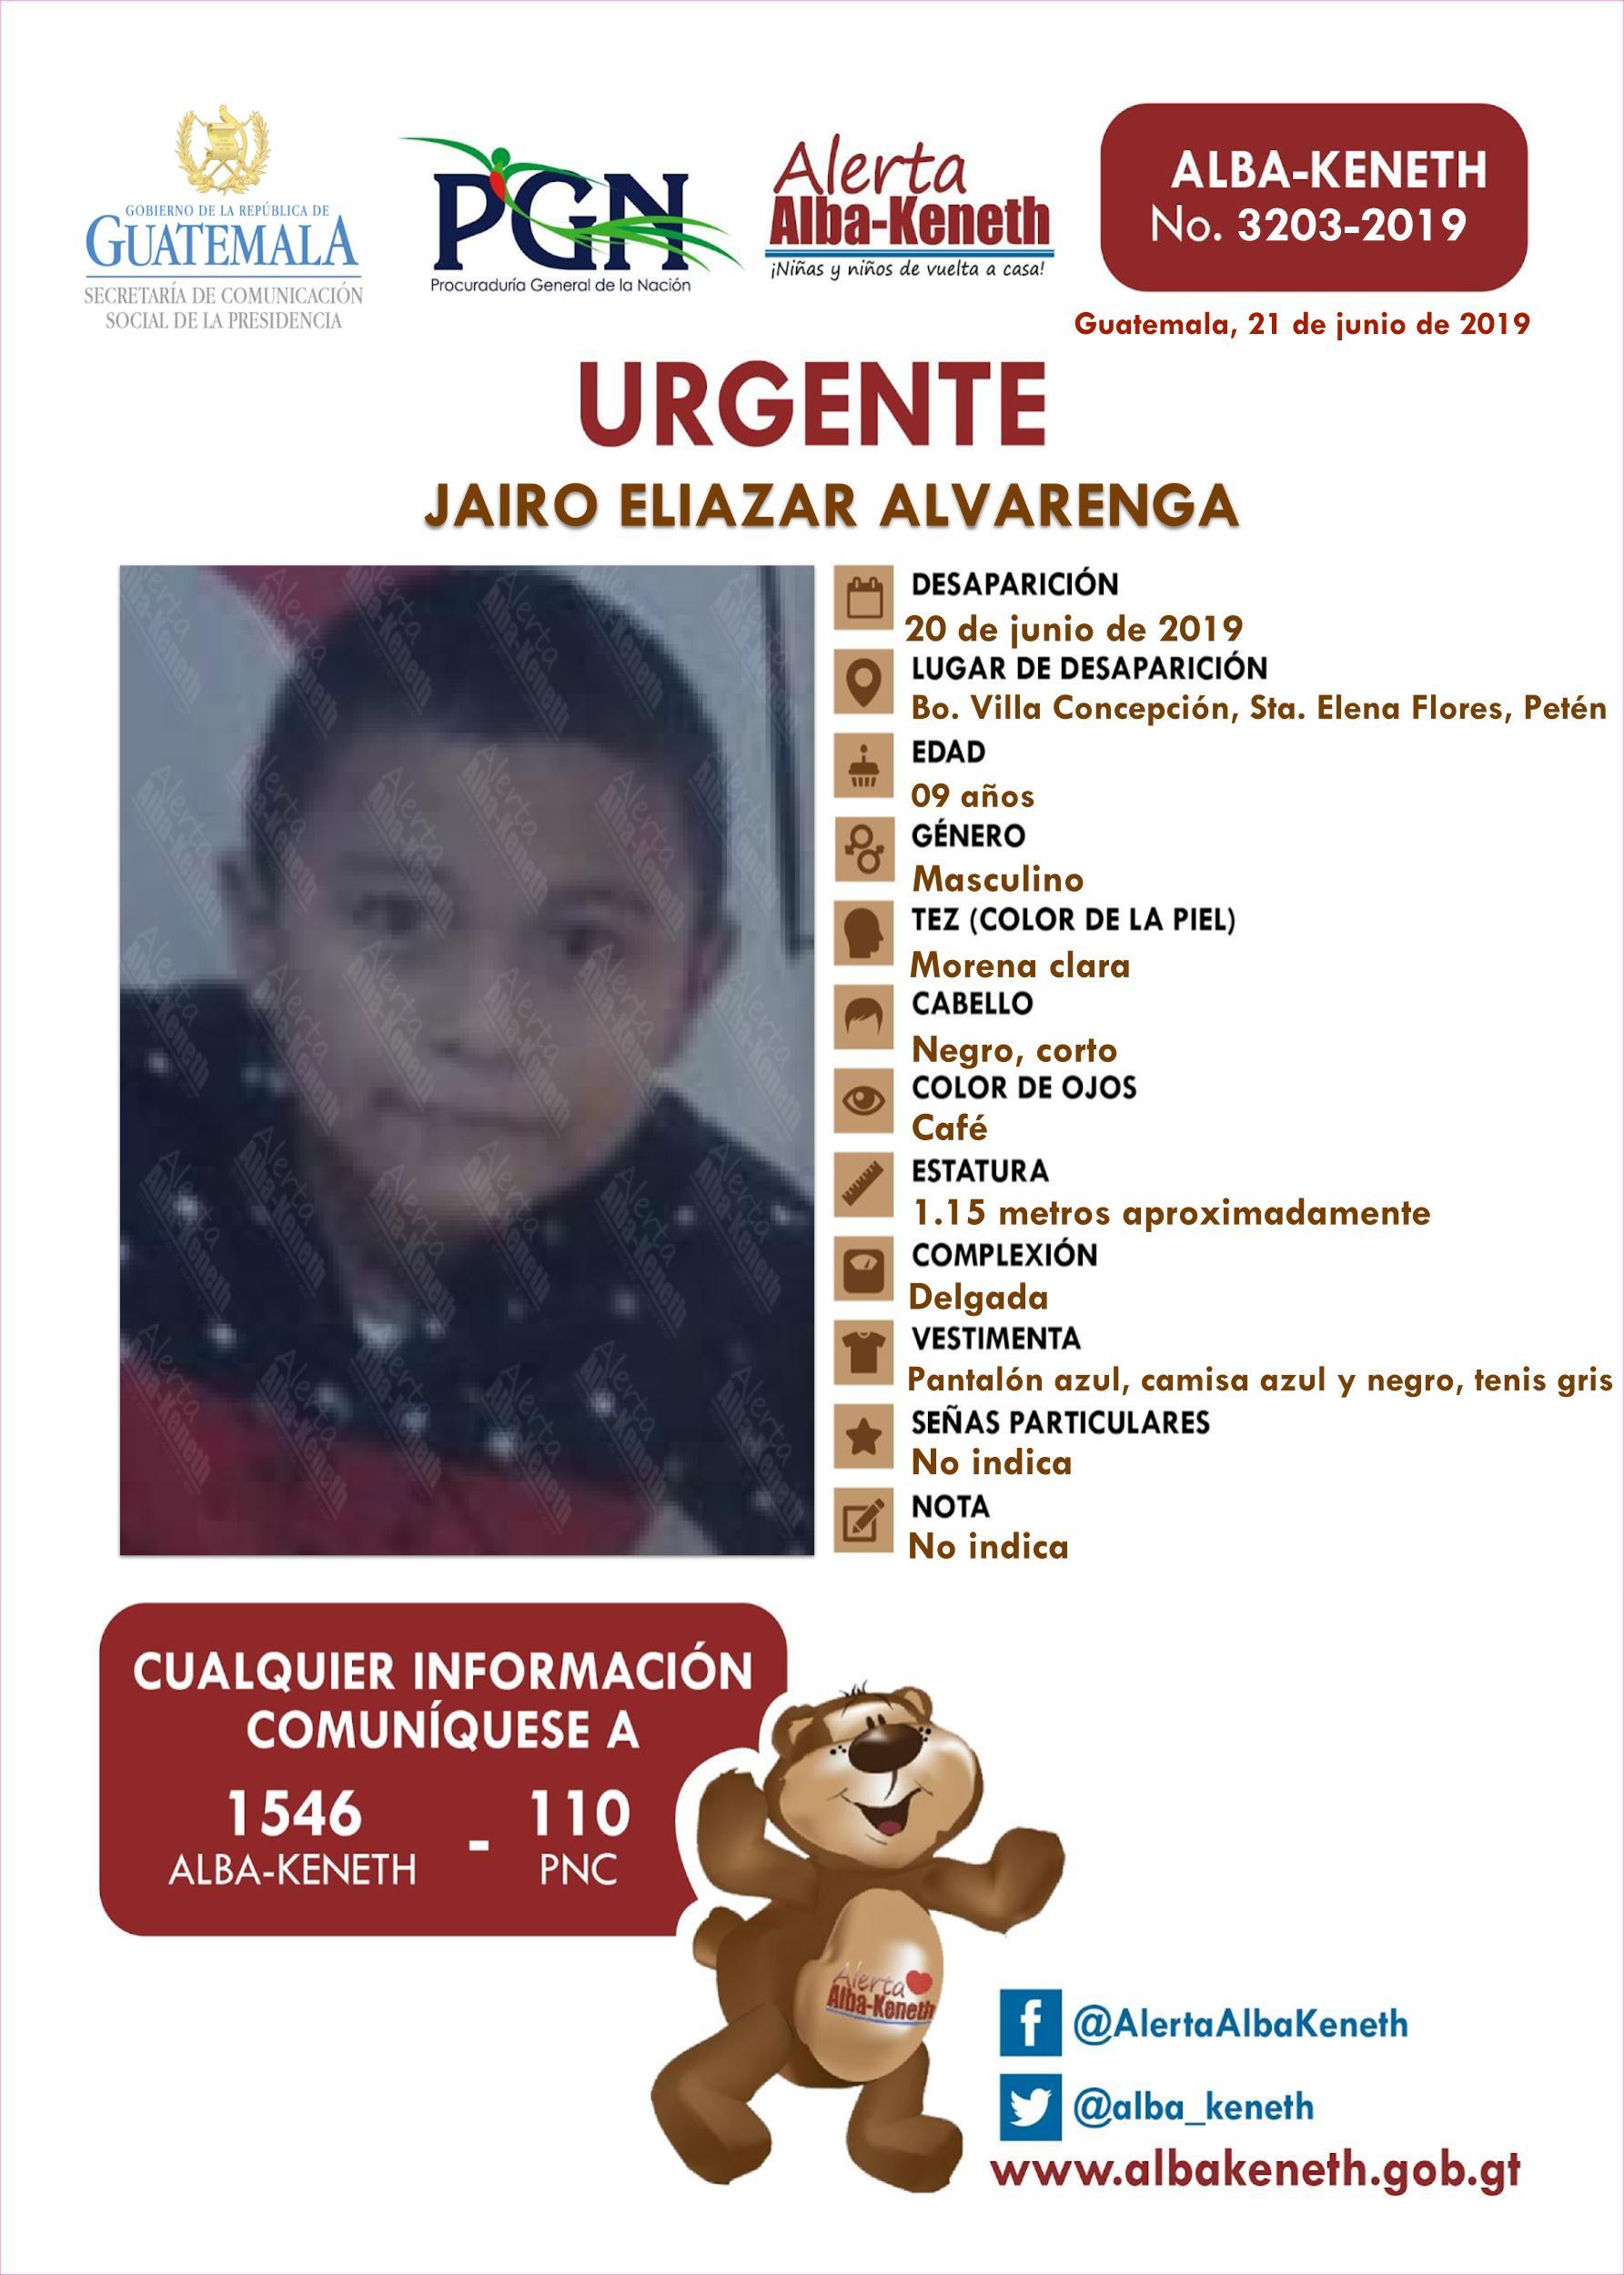 Jairo Eliazar Alvarenga